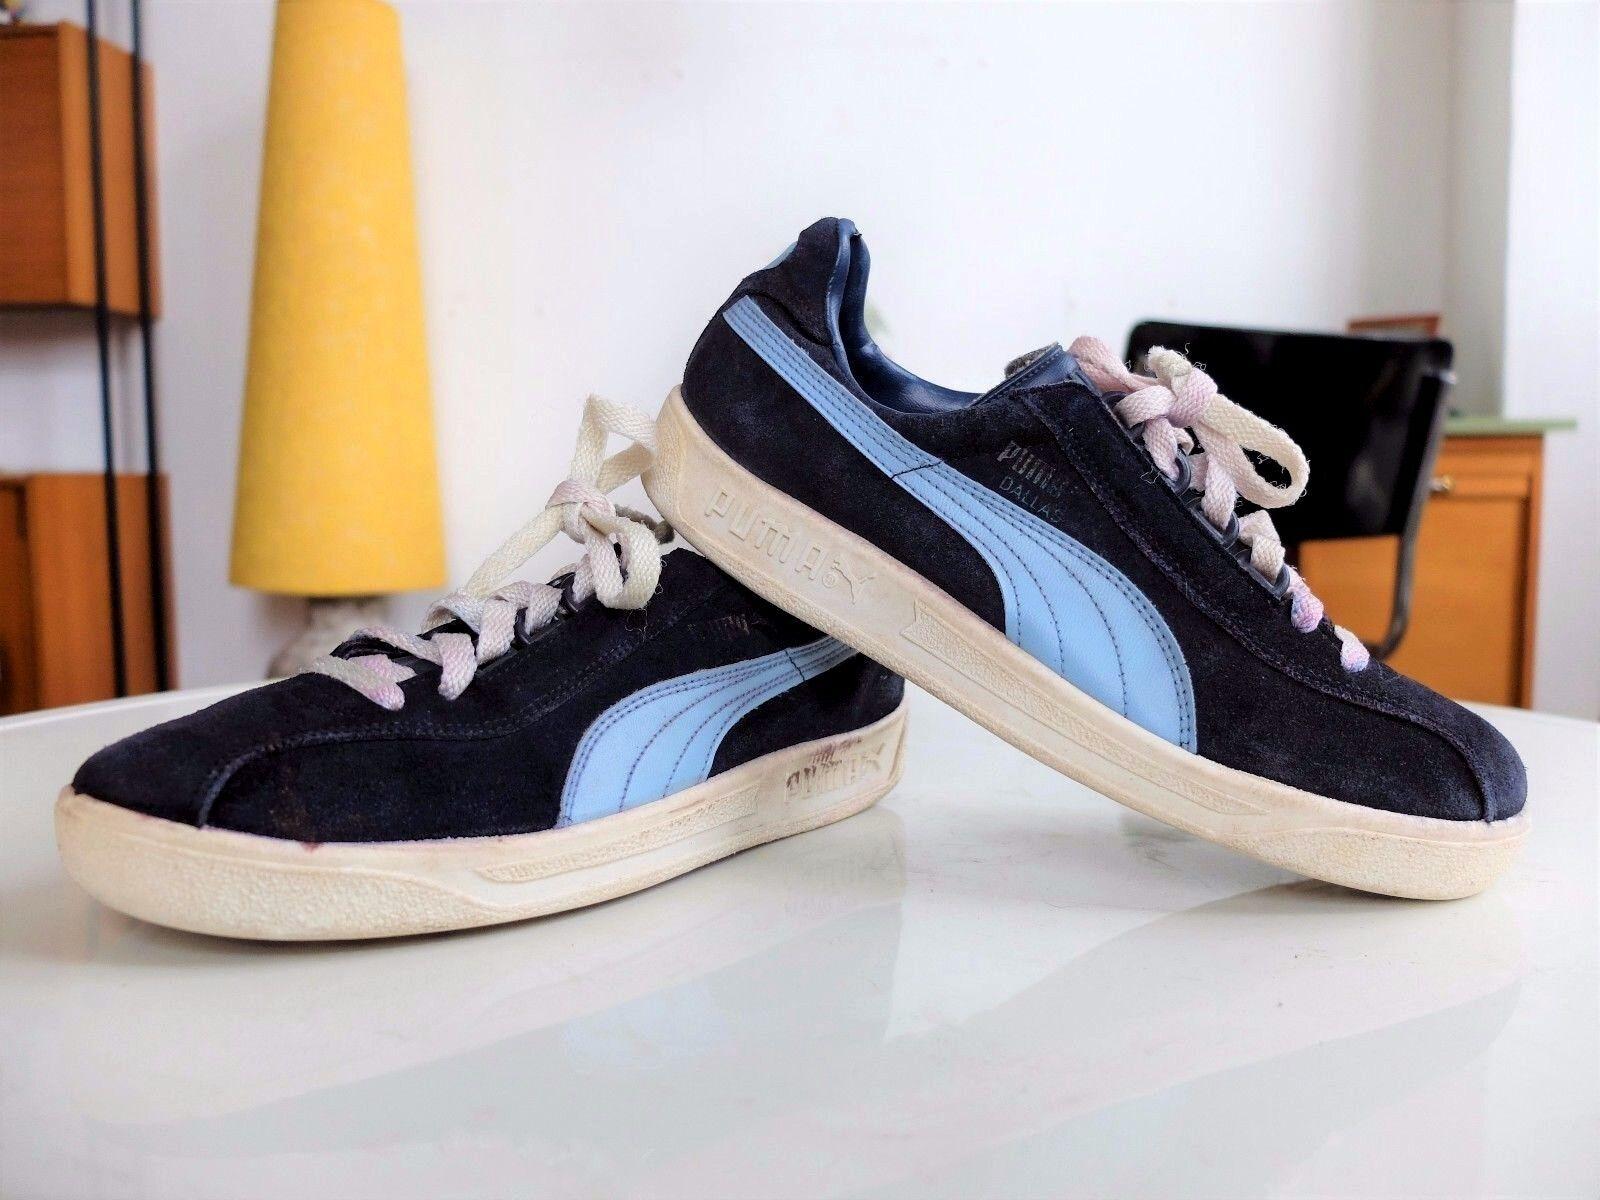 PUMB DBLLBS Sneakers Blue Kult Turnschuhe 70er TRUE VINTBGE UK 5,5 Sportschuhe